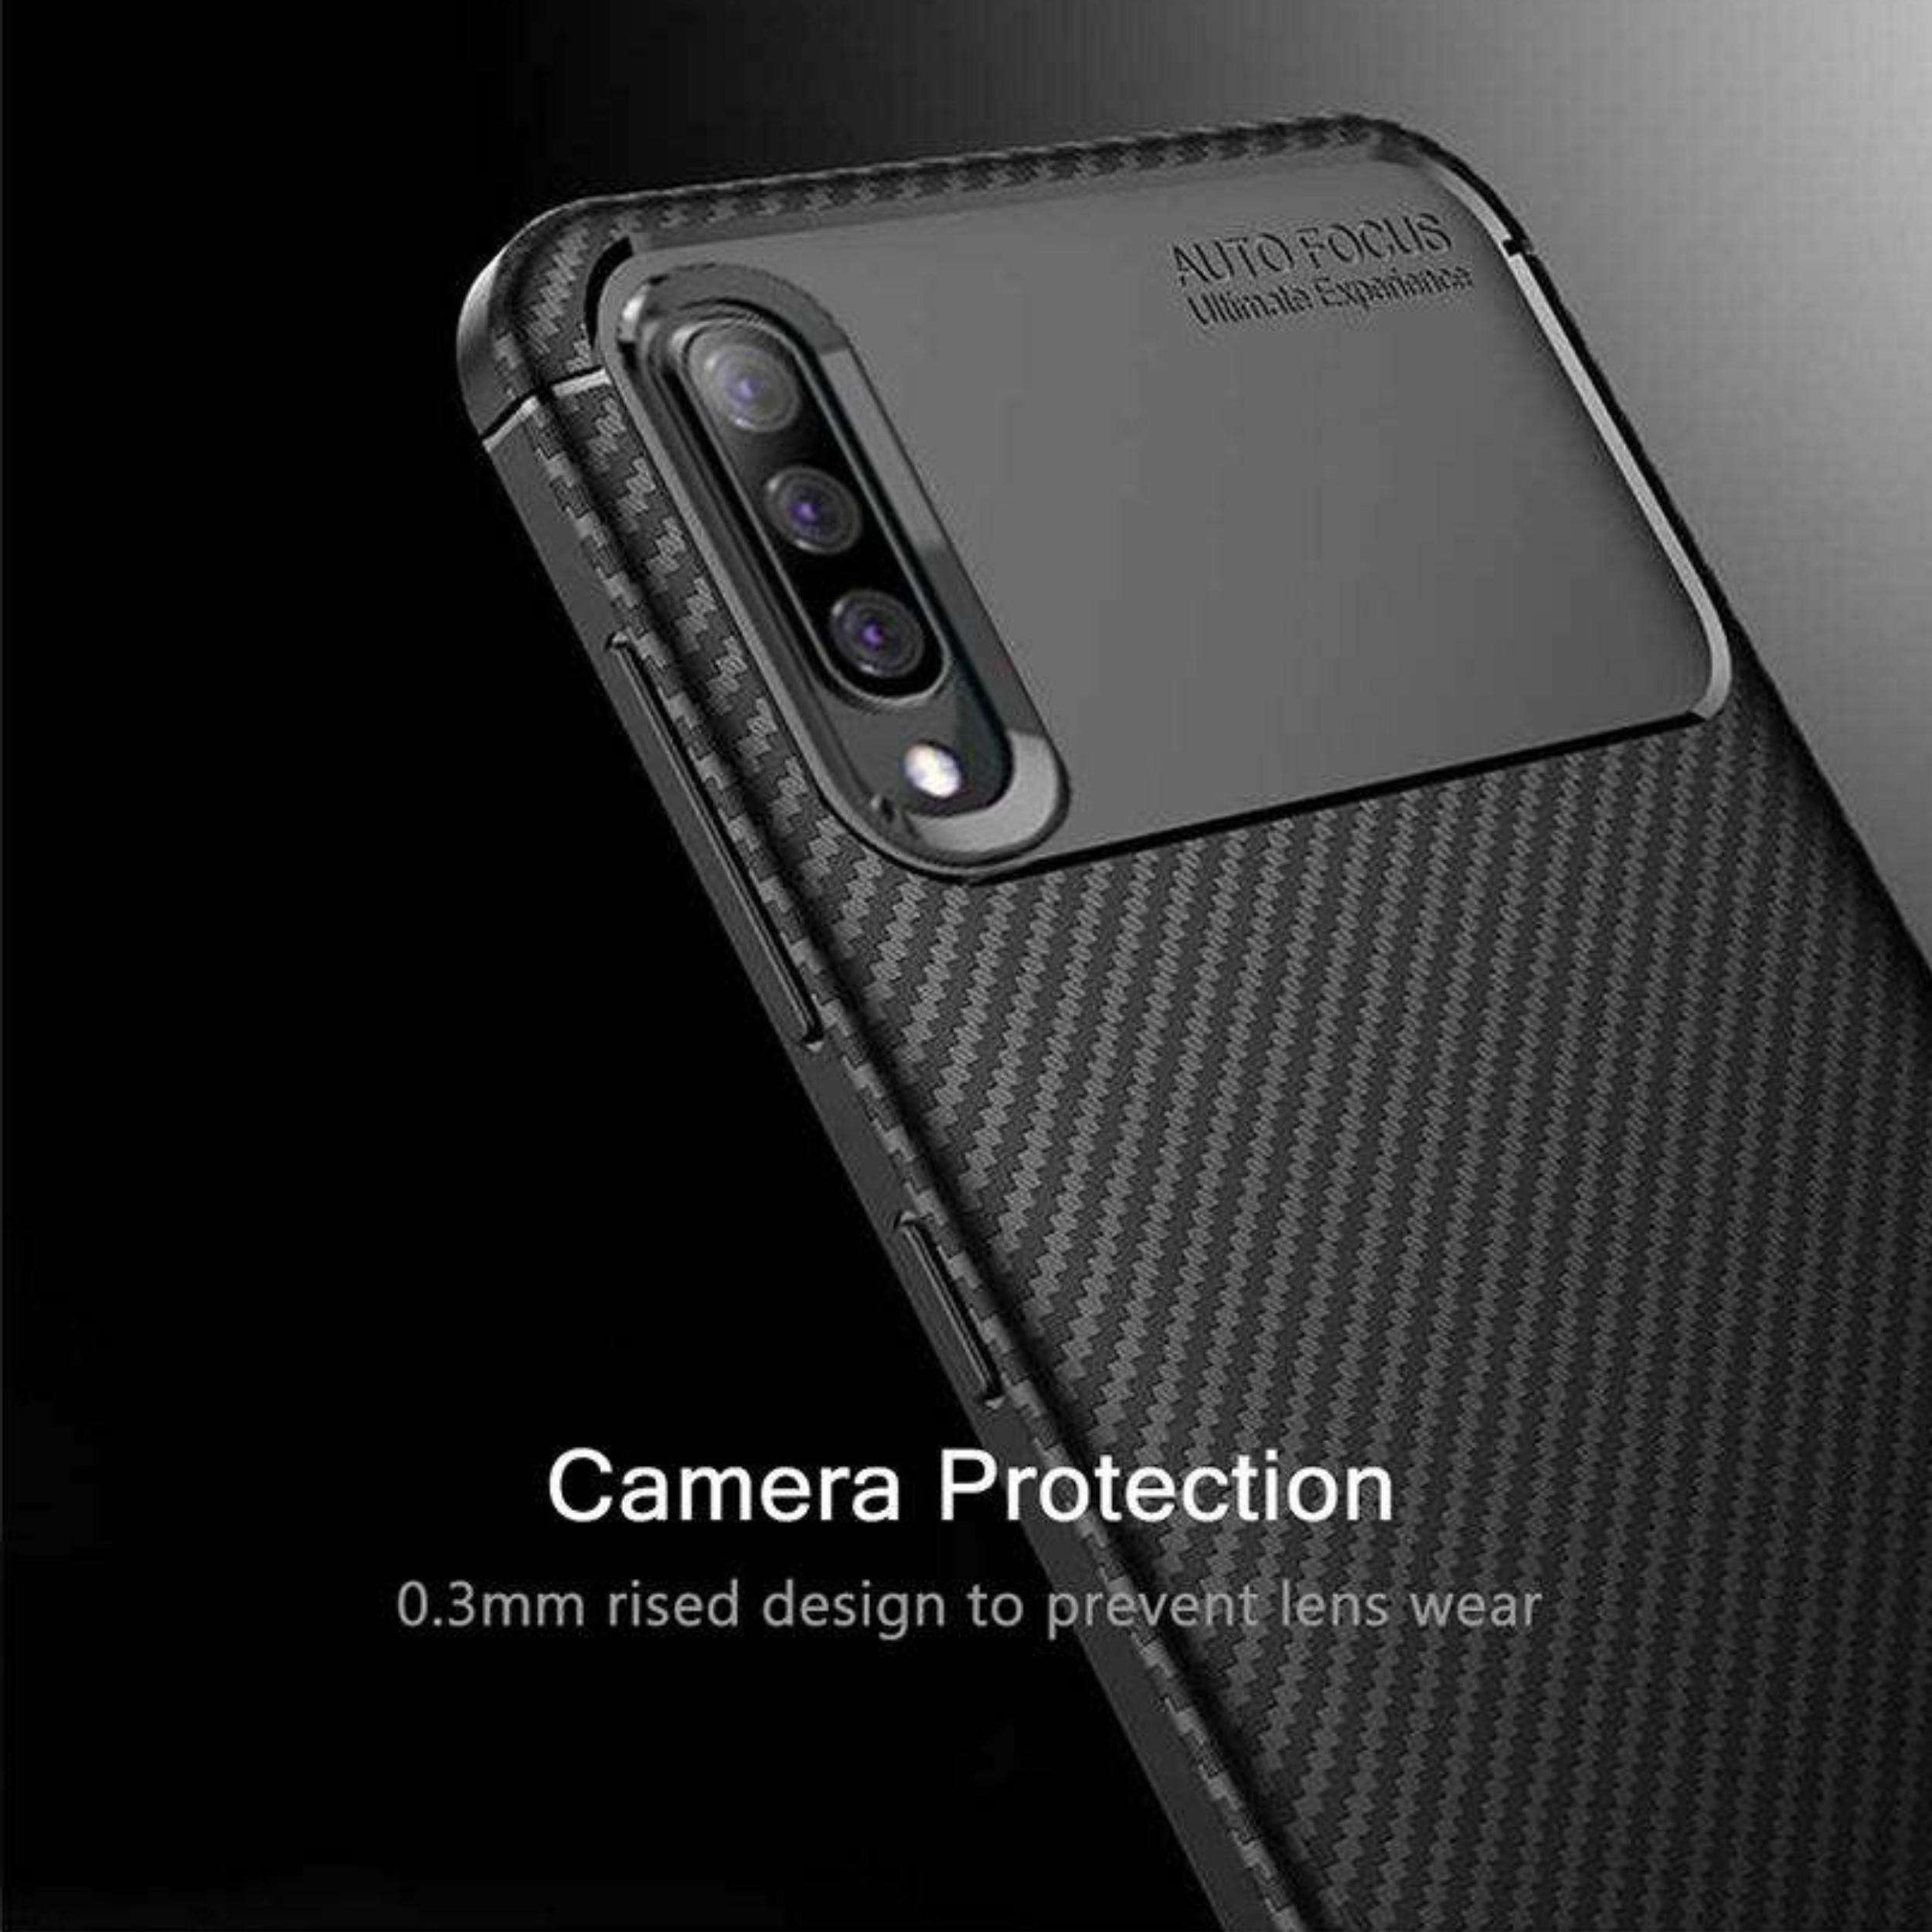 کاور لاین کینگ مدل A21 مناسب برای گوشی موبایل سامسونگ Galaxy A70/ A70S thumb 2 3